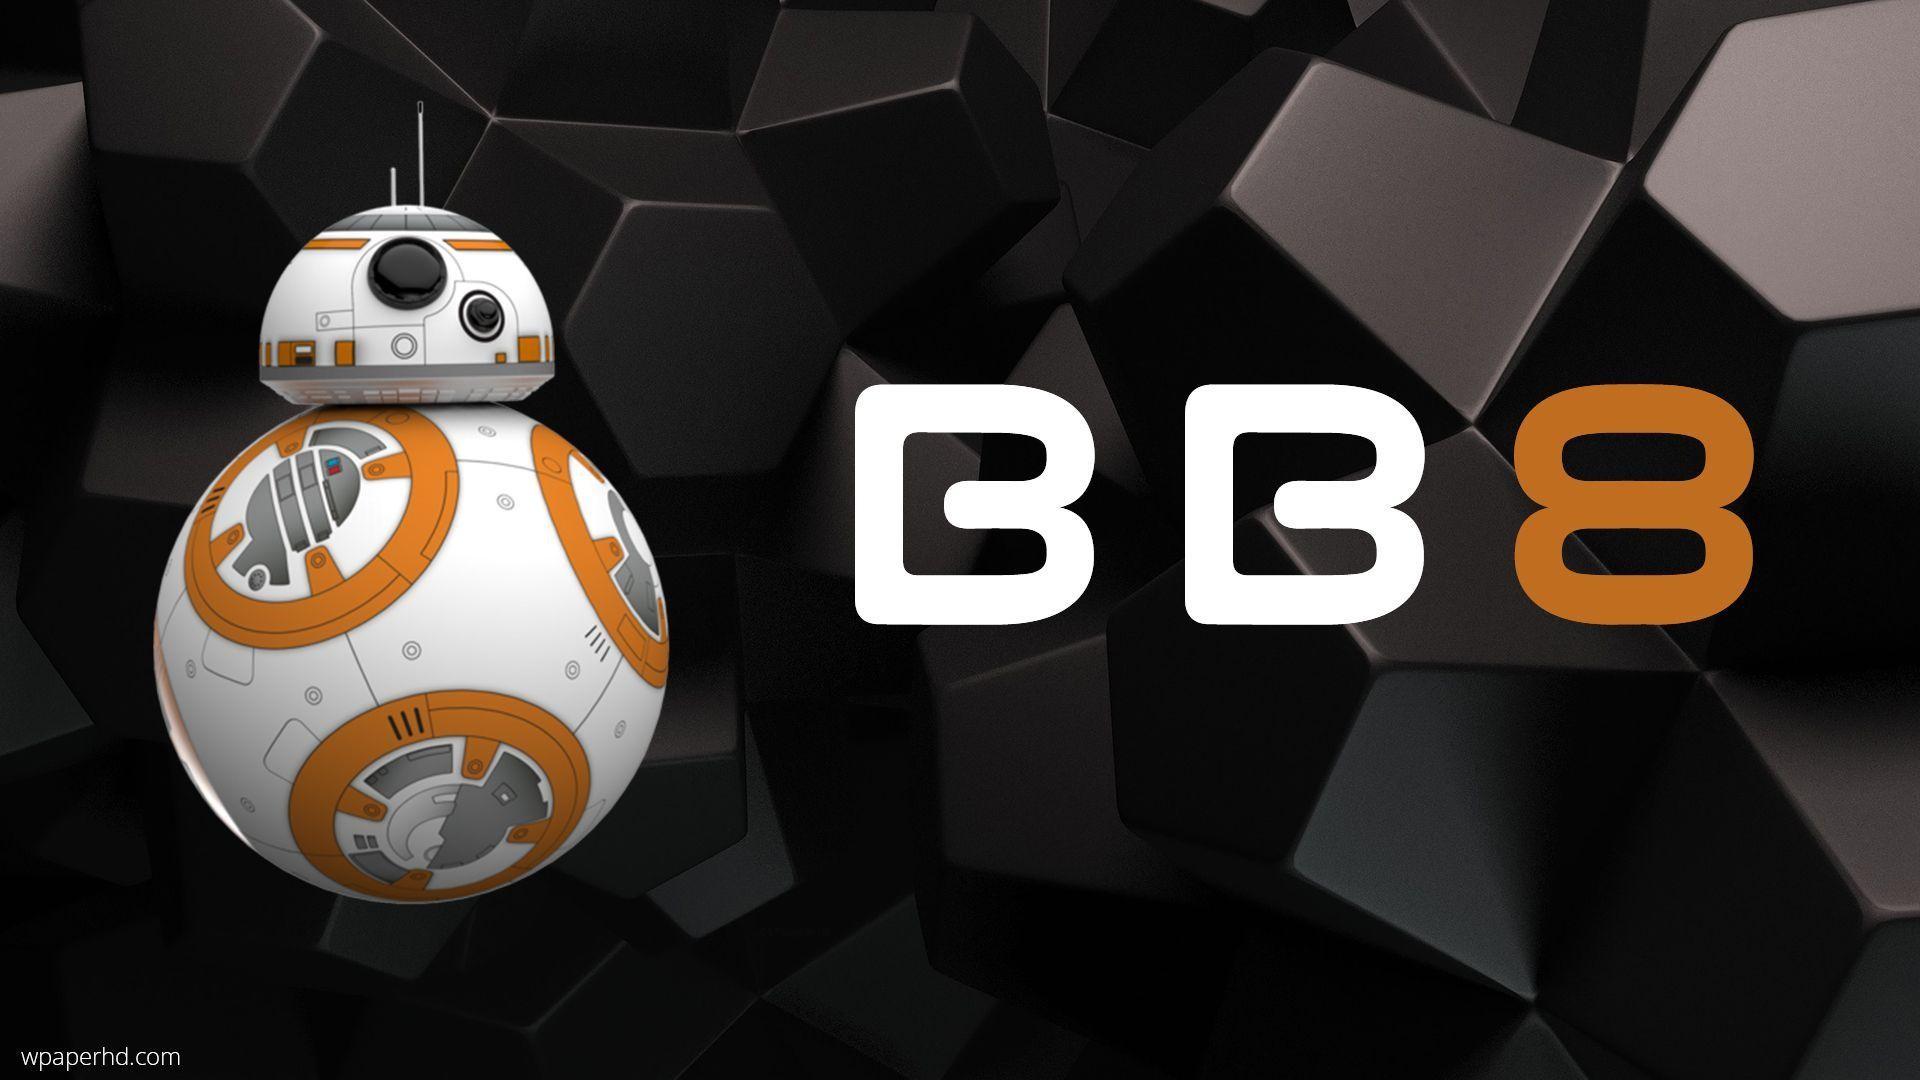 Star Wars BB8 wallpaper HD 2016 in Star Wars   Wallpapers HD